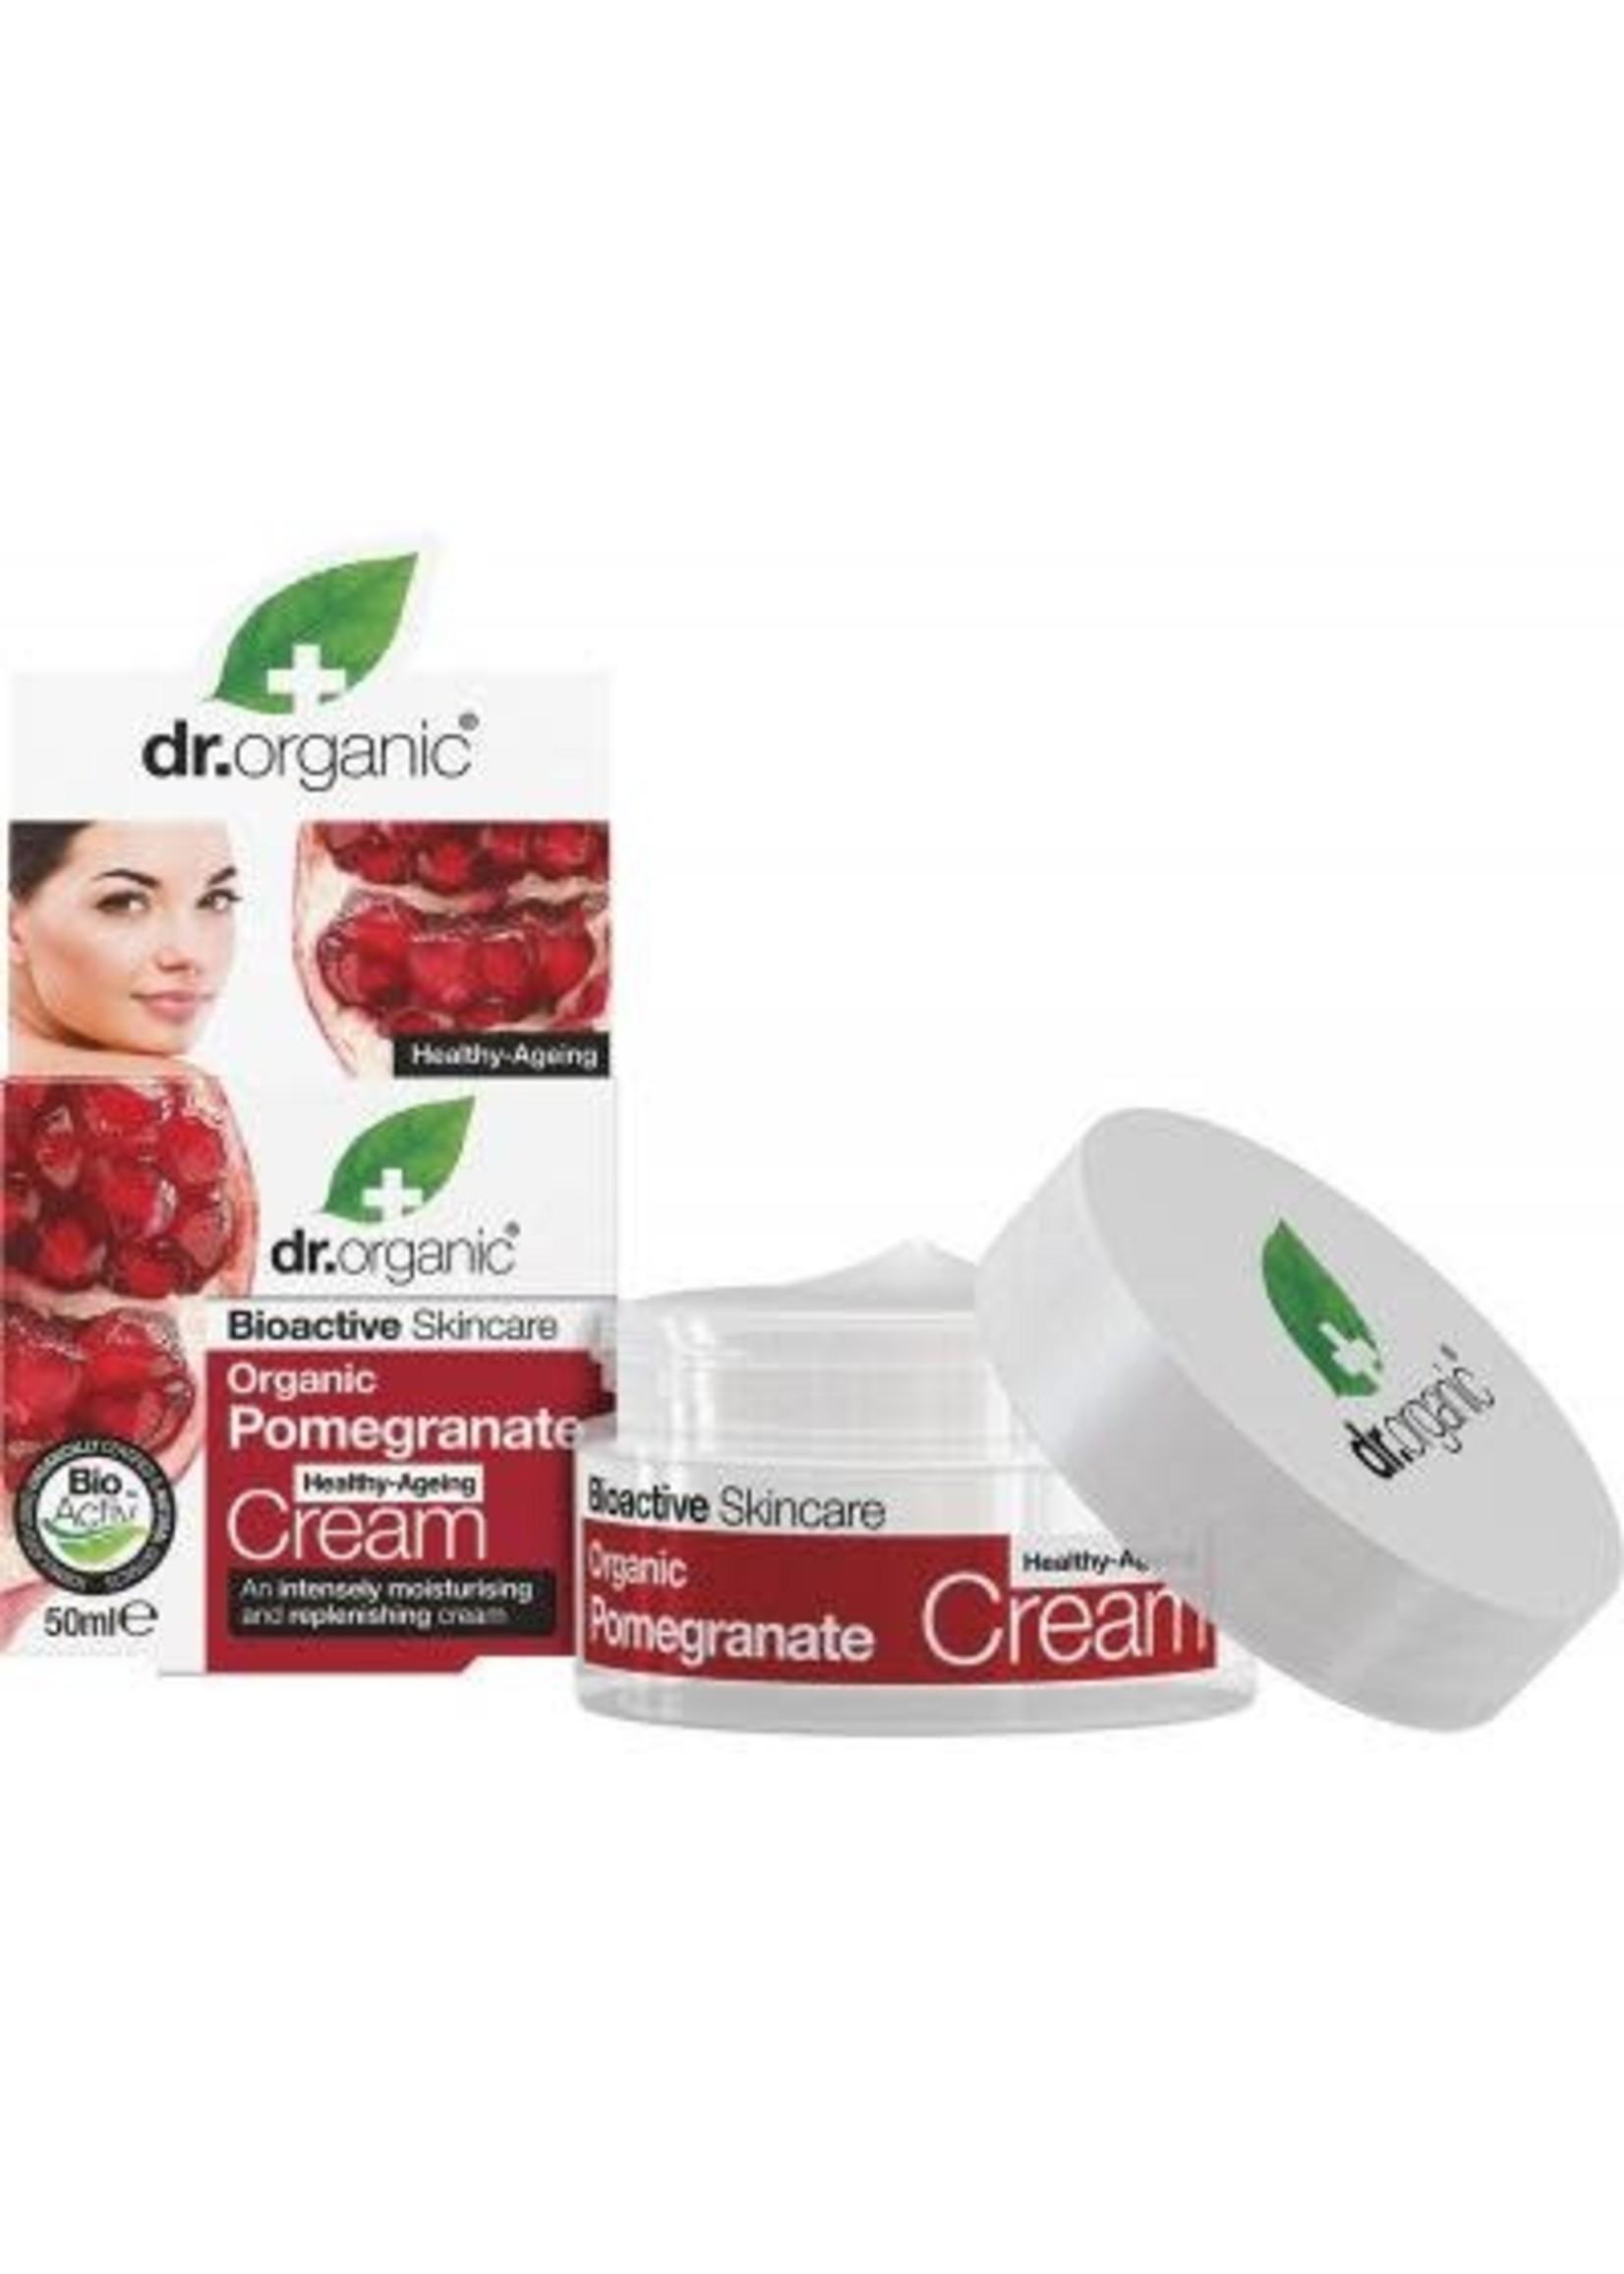 Dr Organic Dr Organic  Healthy -aging Cream Organic Pomegranate 50ml